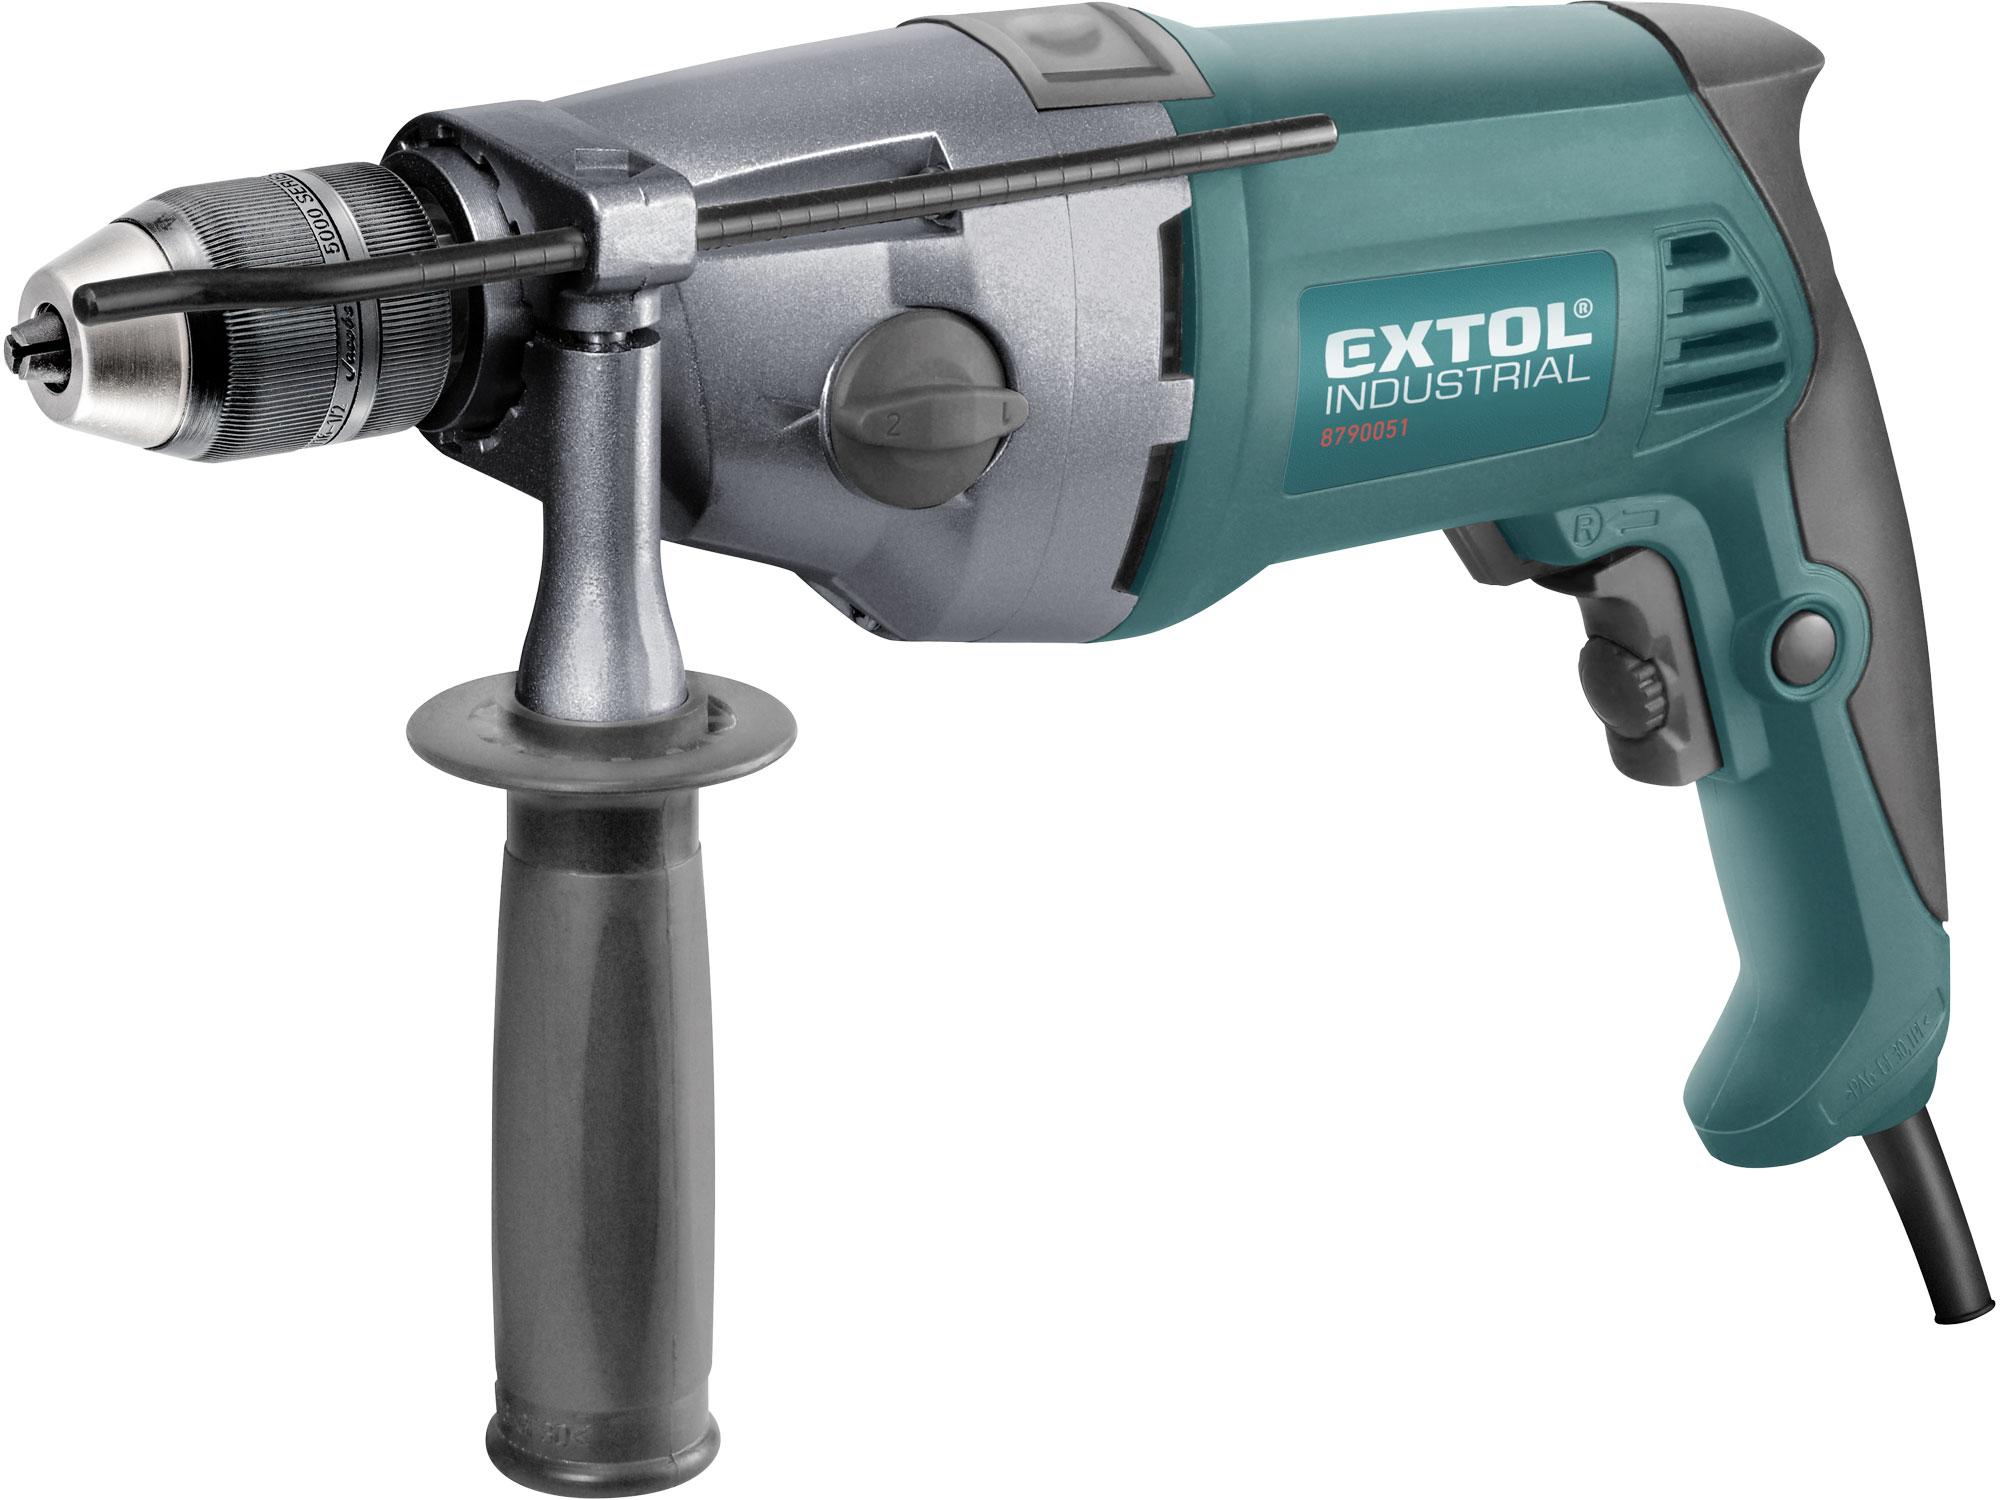 Hammer Drill, Capacity 1.5-13mm, 1050W, Keyless Chuck